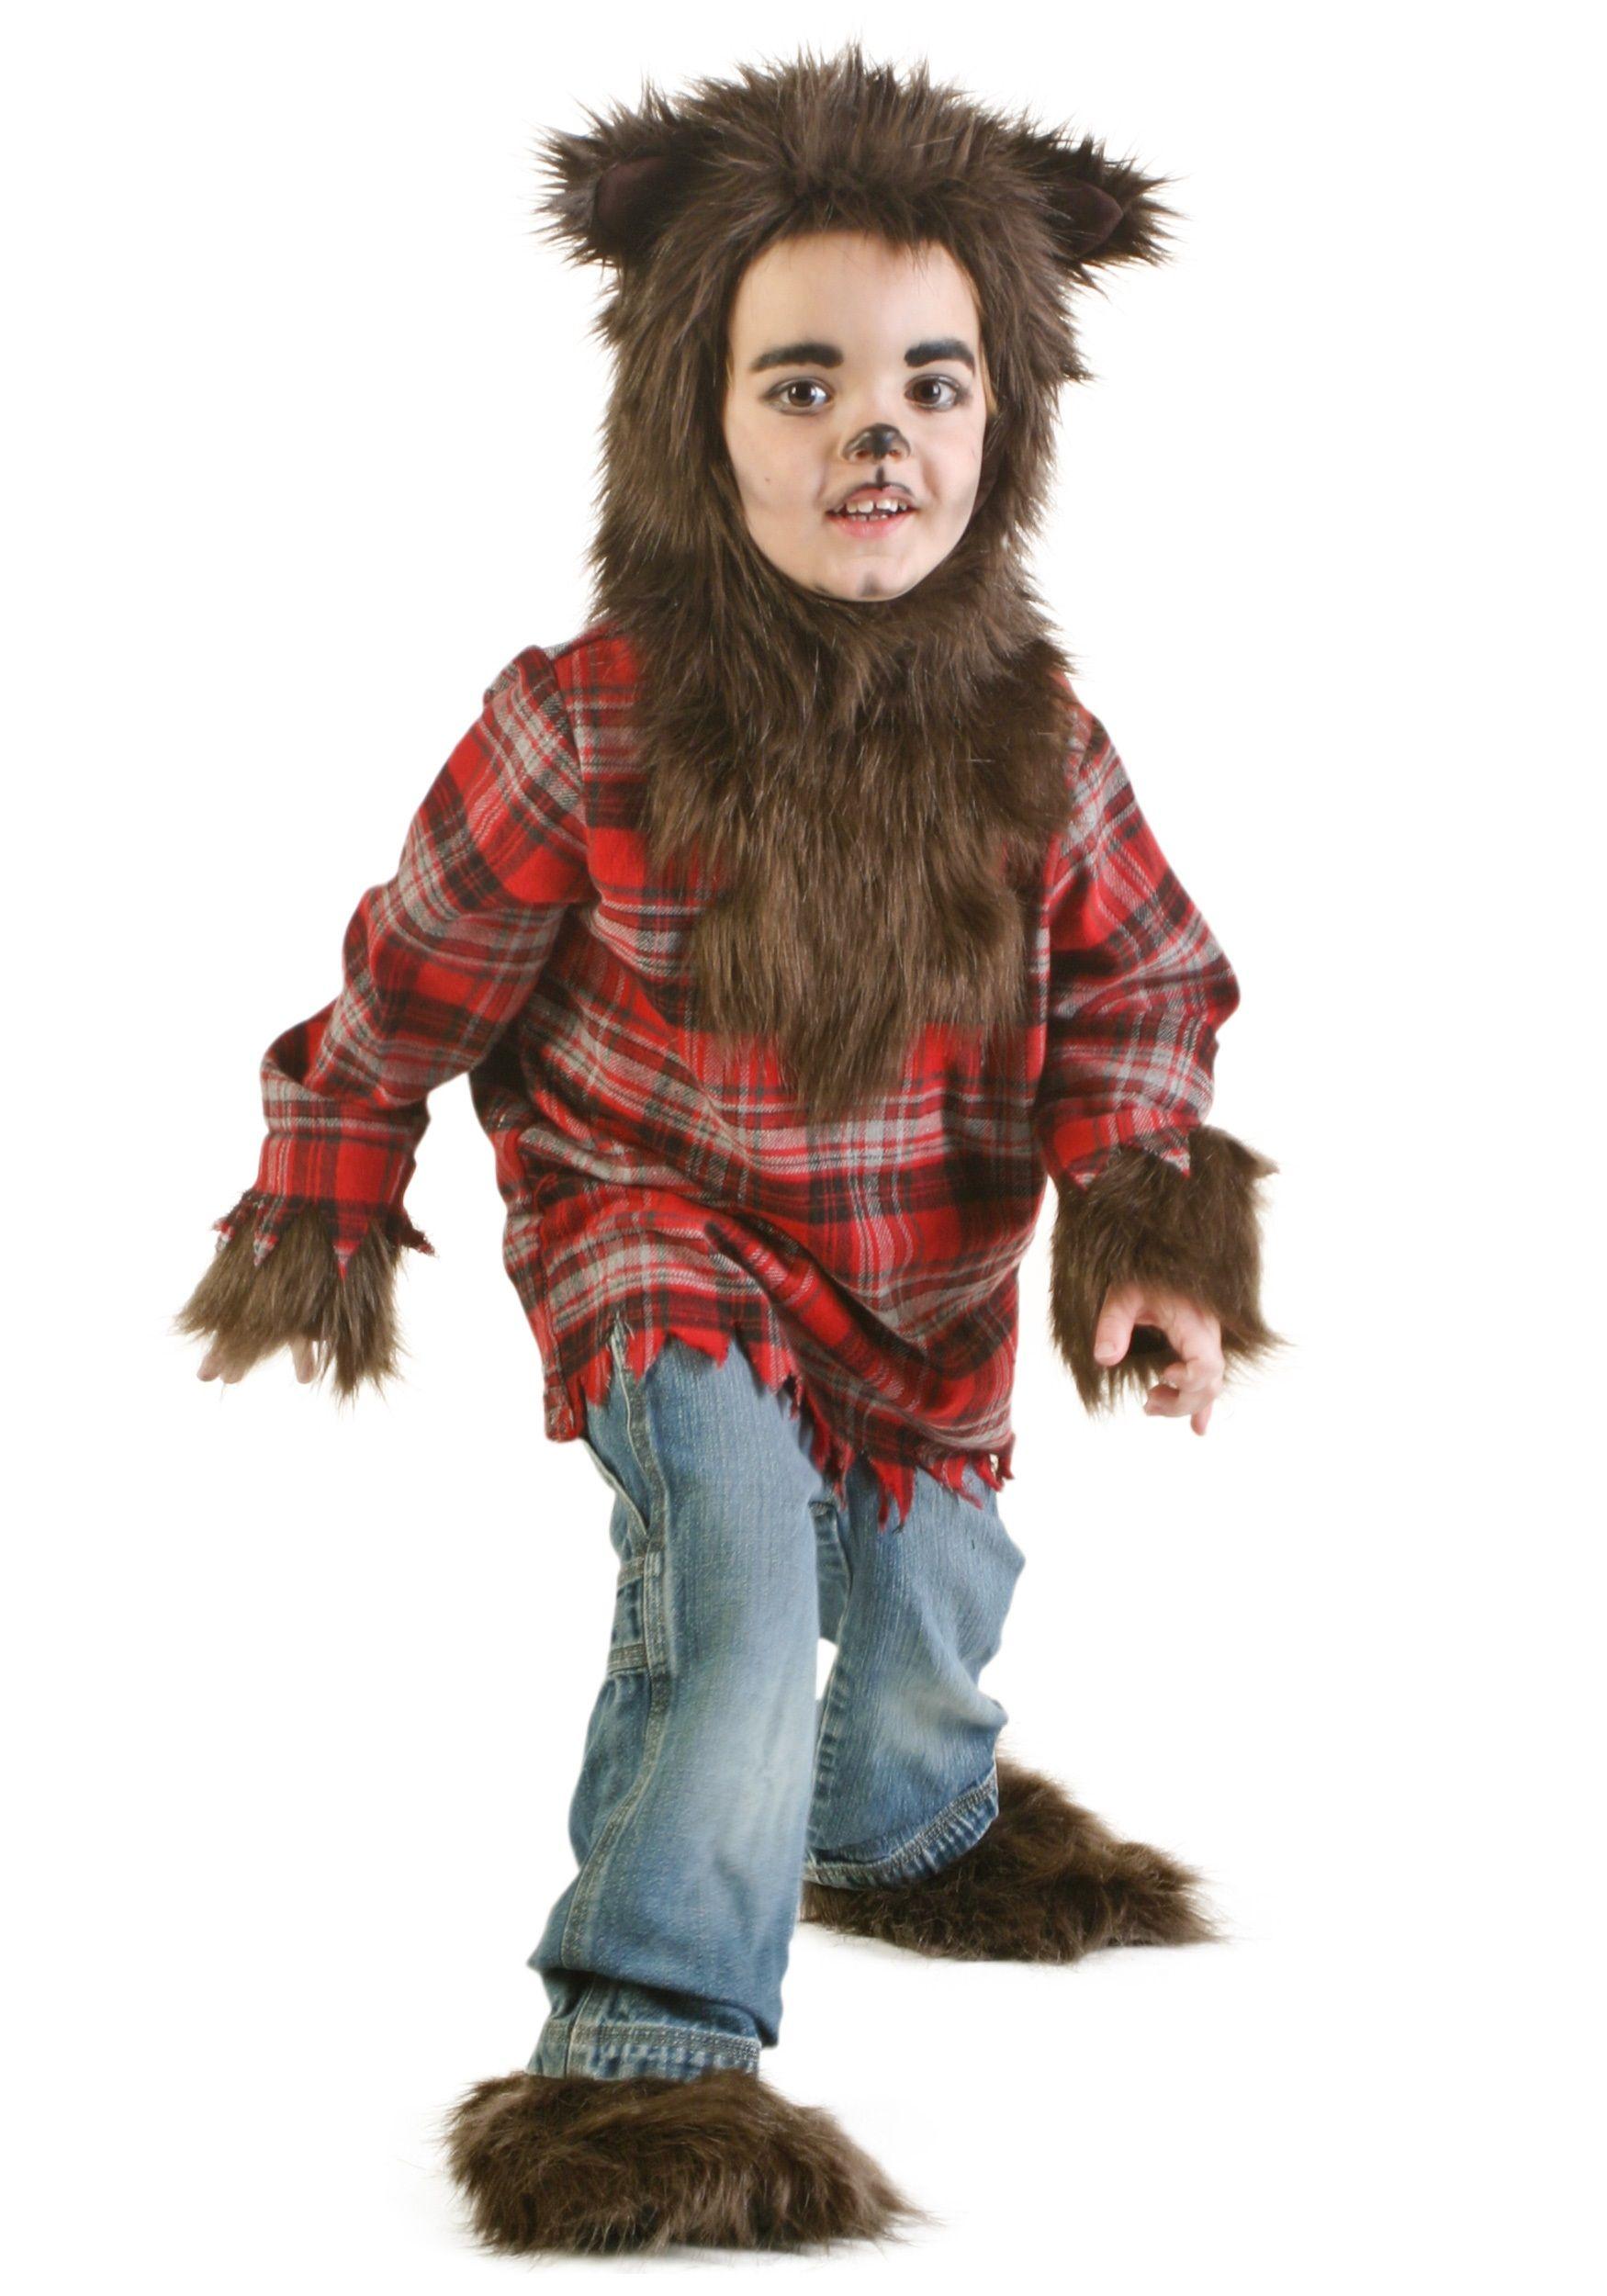 Toddler Werewolf Costume Halloween costume ideas